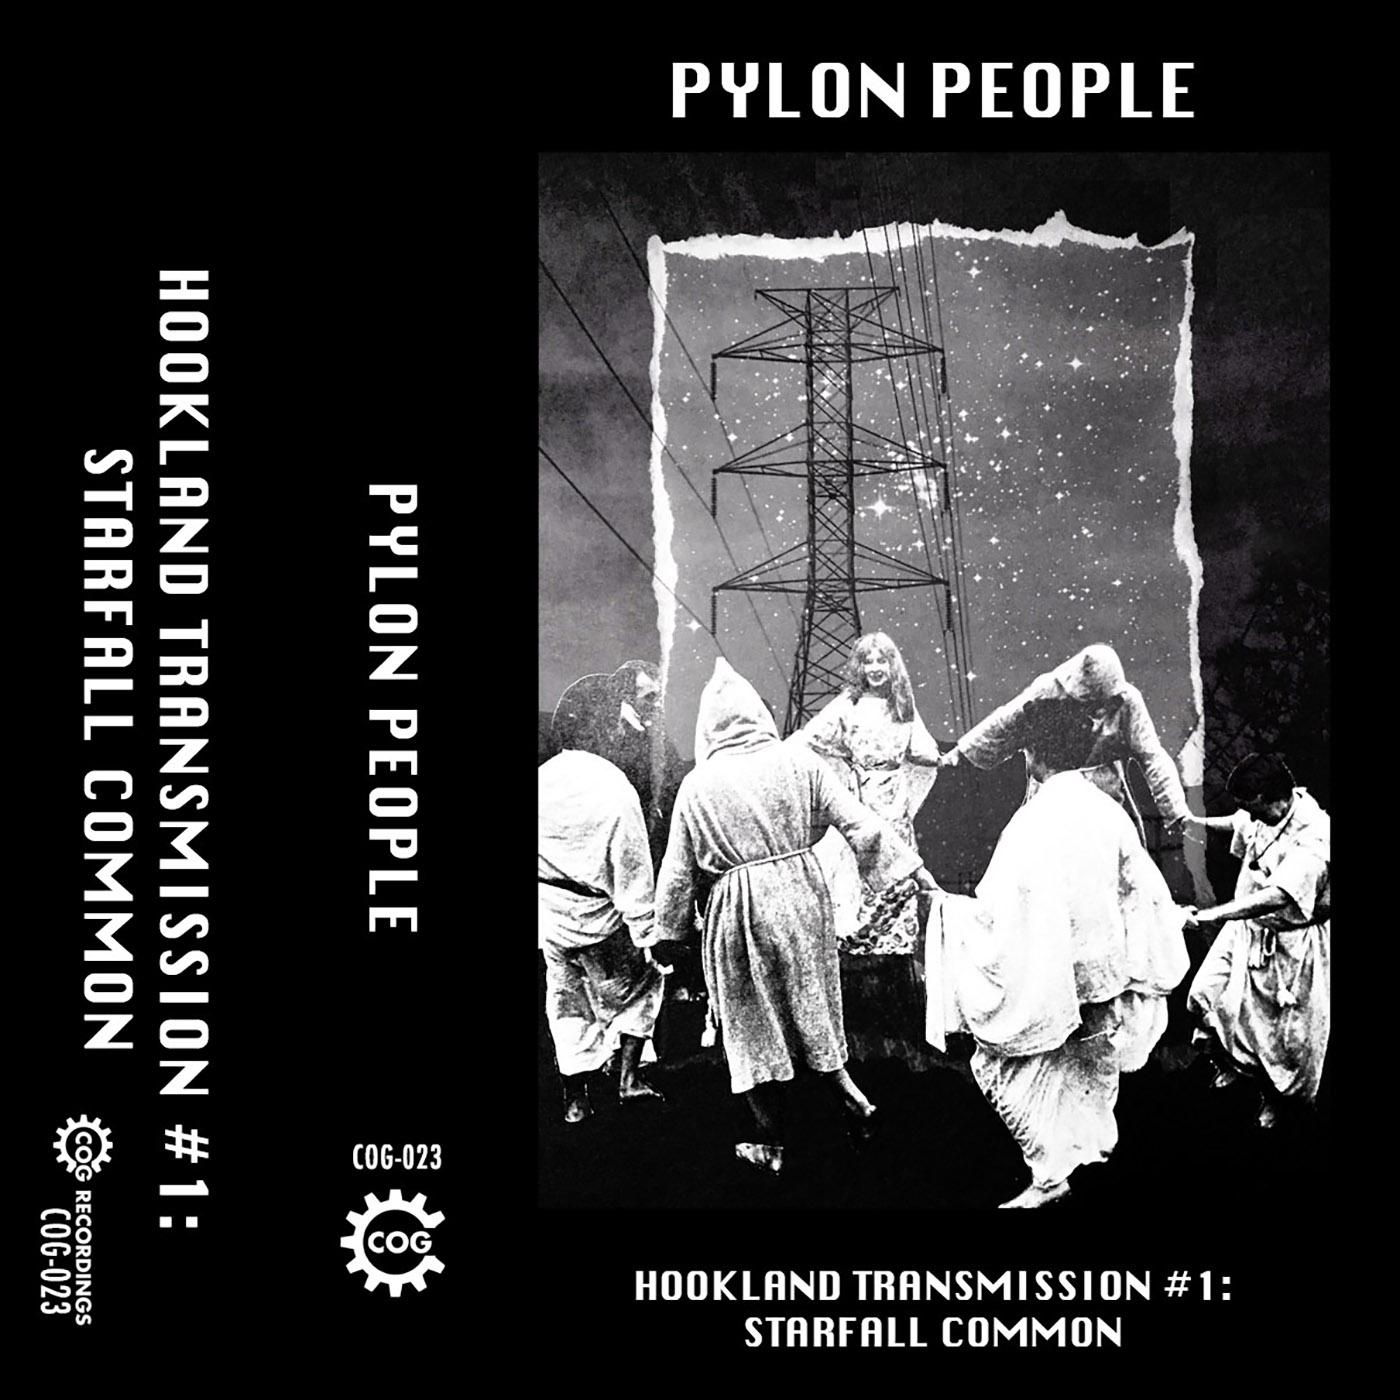 Pylon People - Hookland Transmission #1: Starfall Common